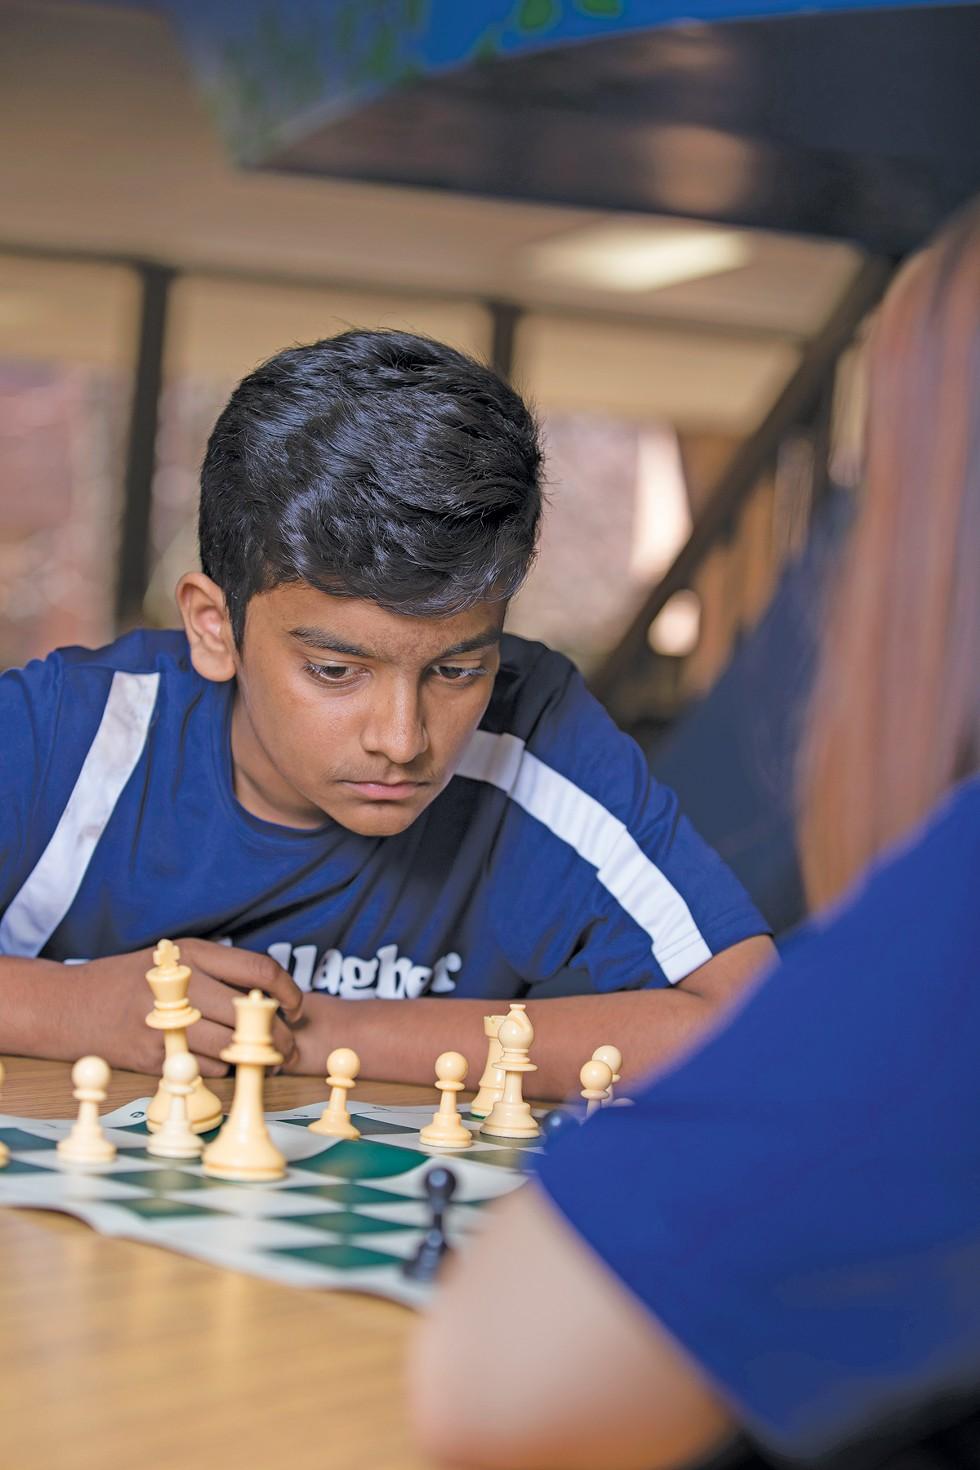 Team captain Akshar Patel at practice. - PHOTO BY KARIN MCKENNA